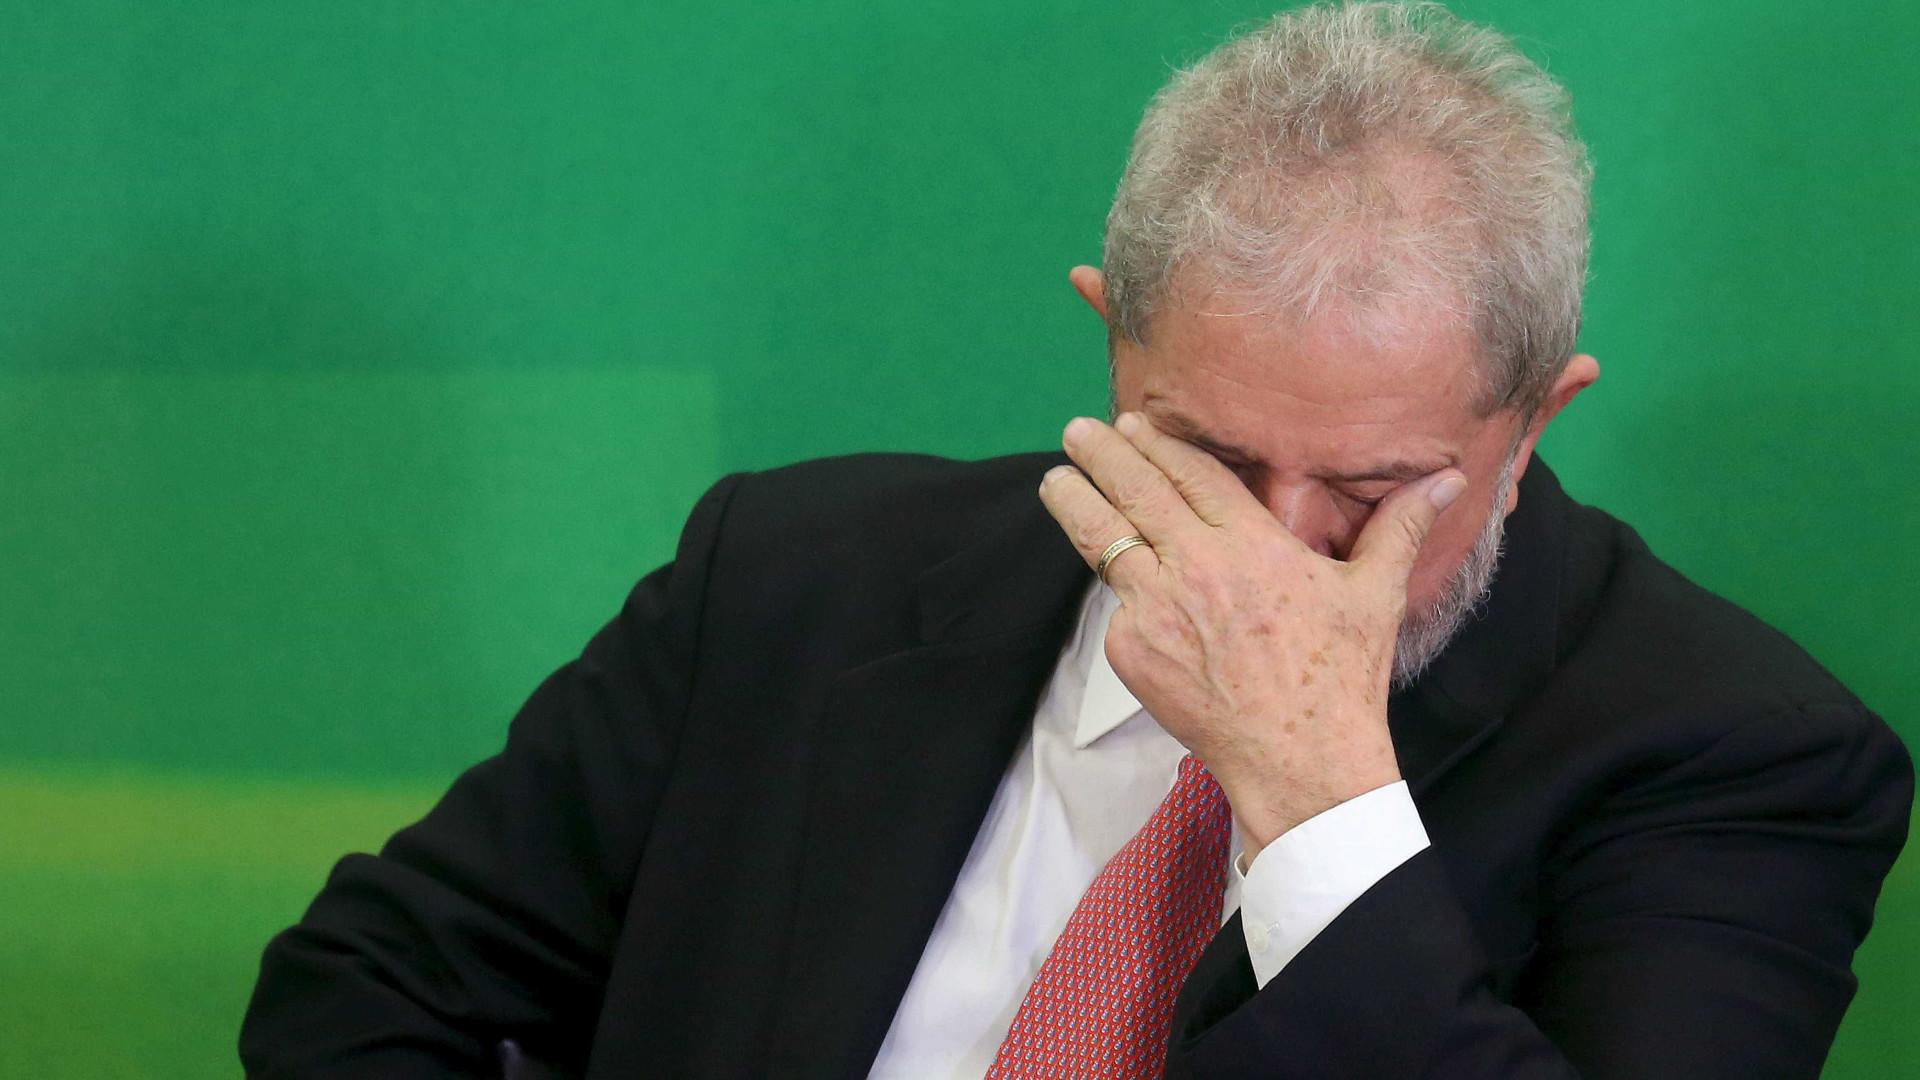 Moro manda bloquear R$ 606 mil de Lula